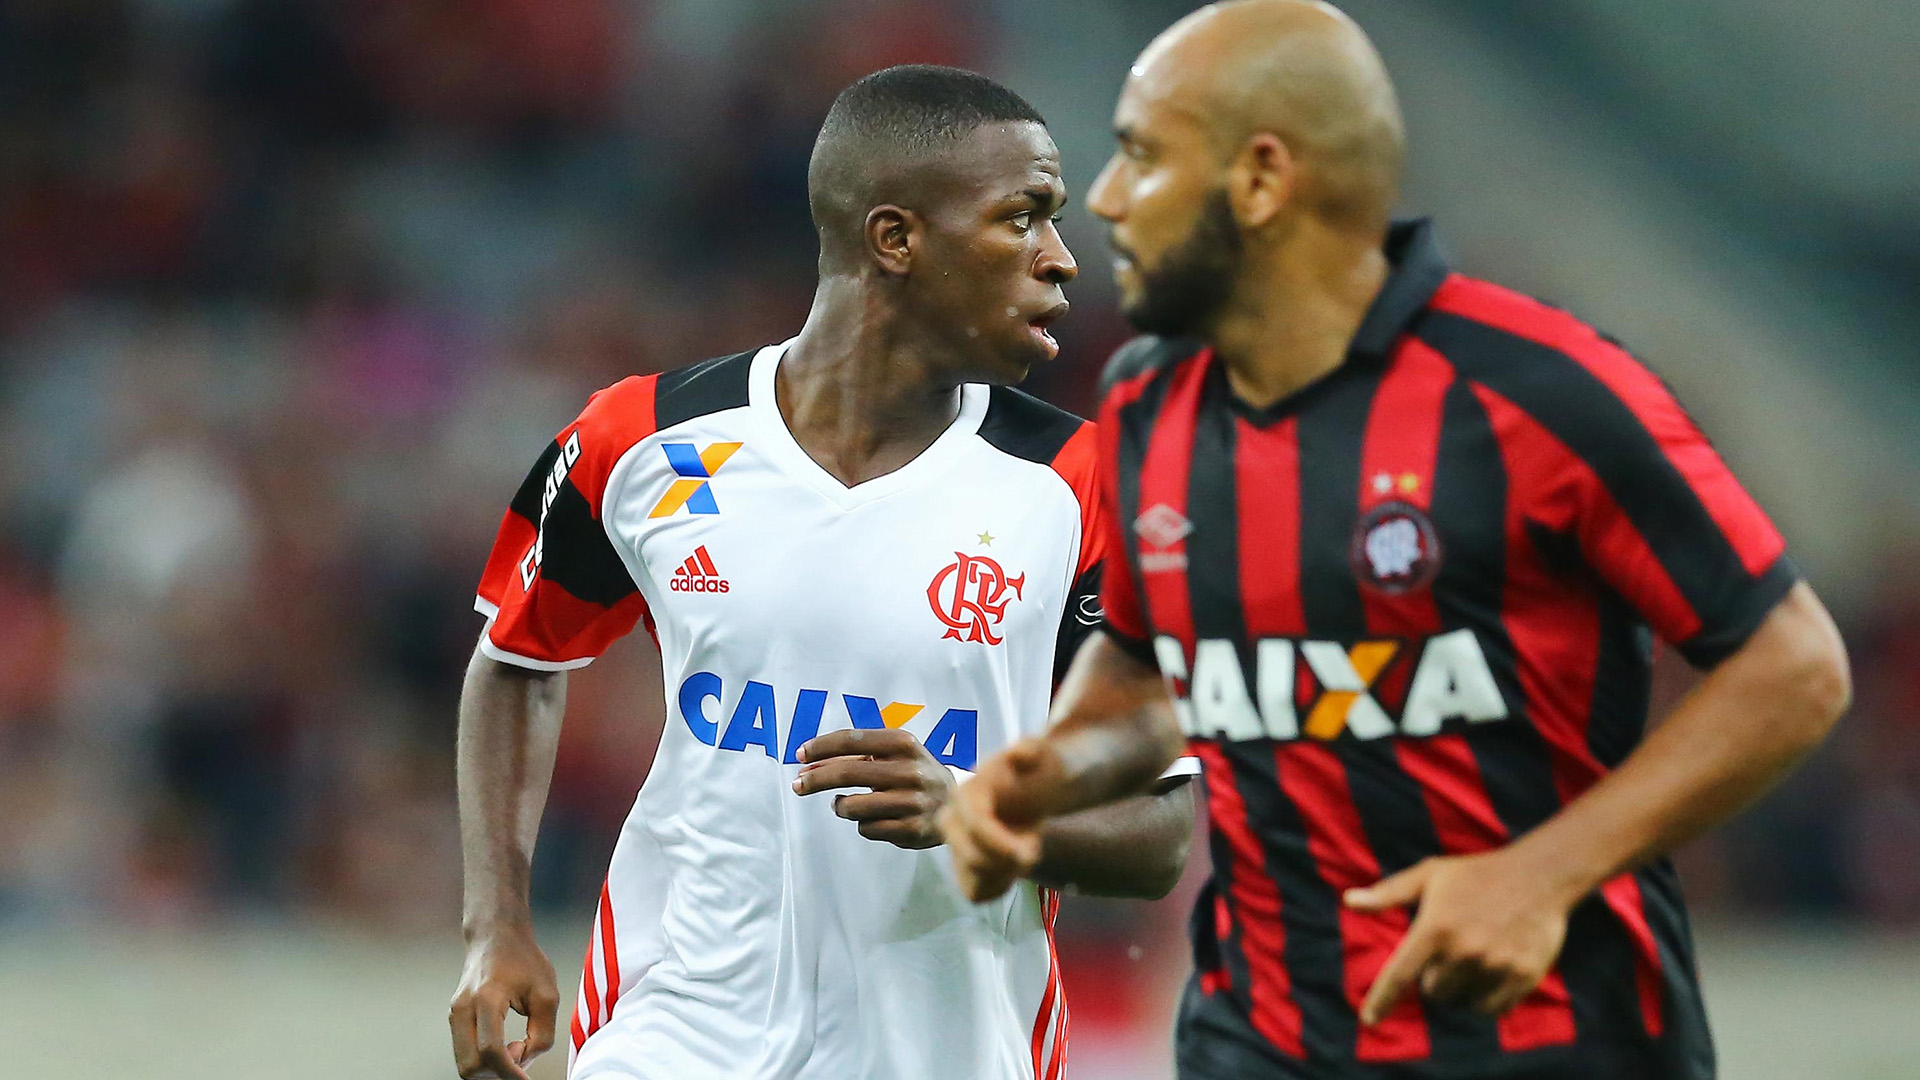 Vinicius Junior Atletico-PR Flamengo Brasileirao Serie A 28052017